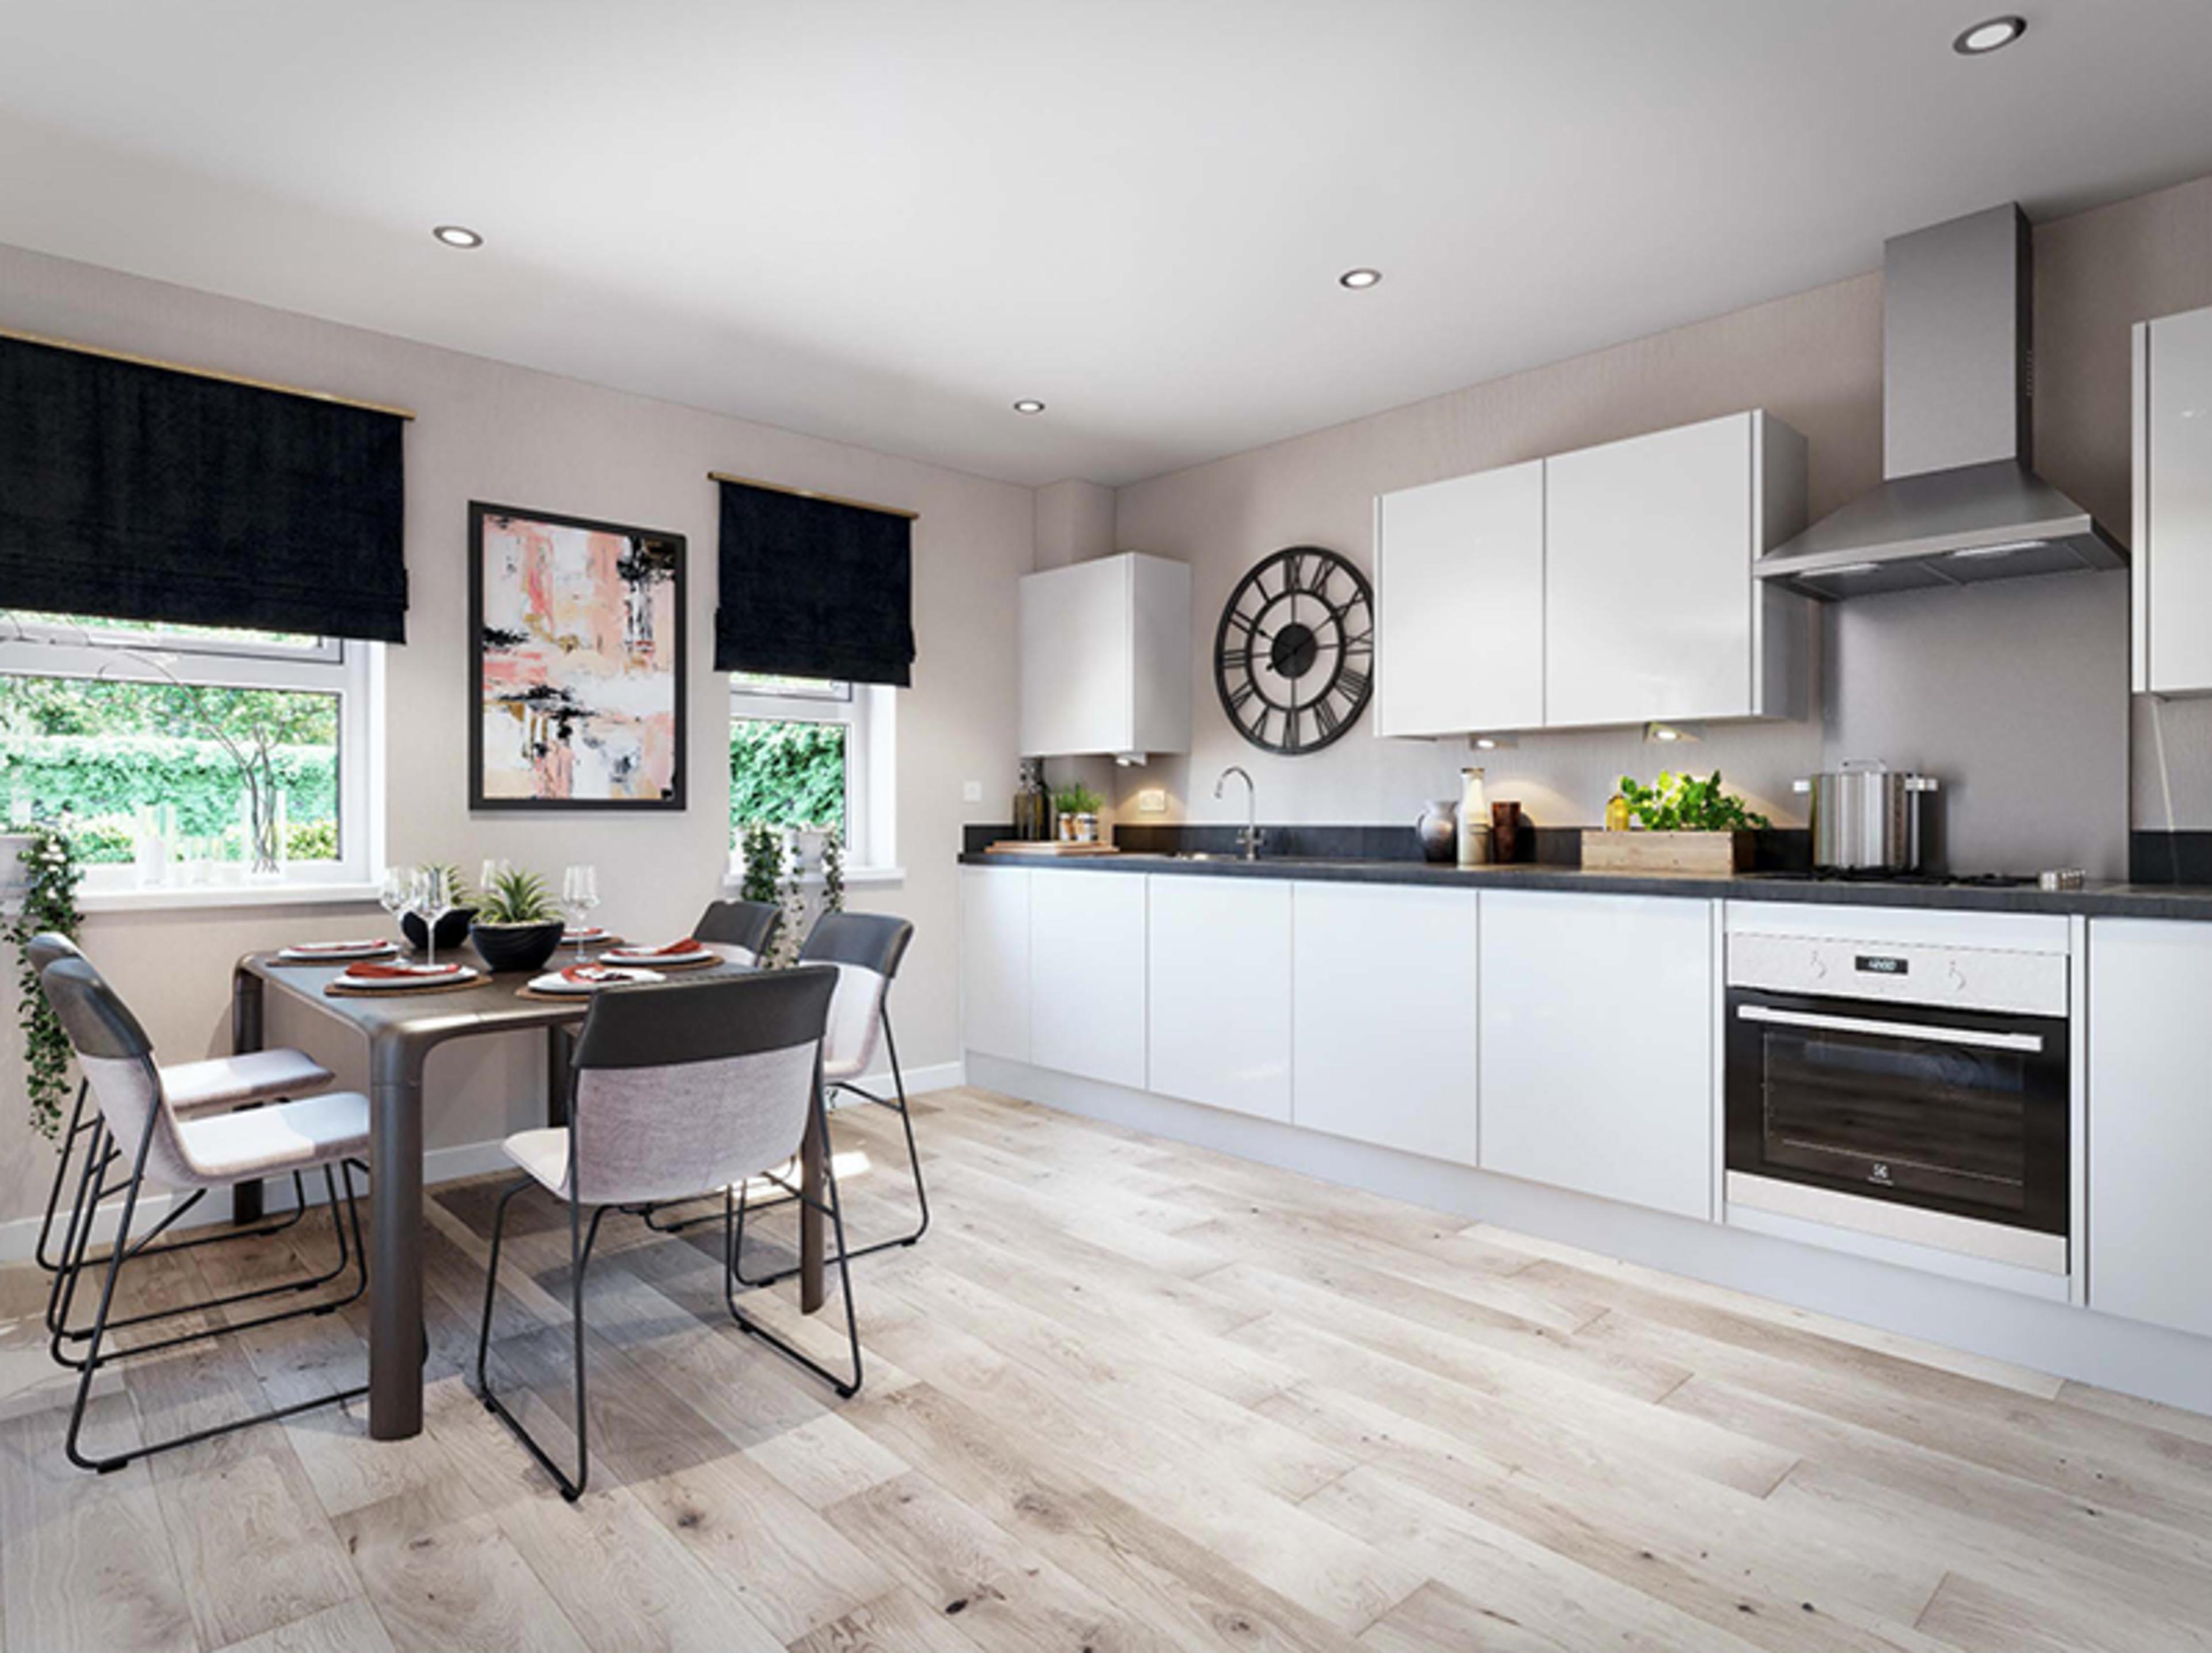 woolner-brook-wigton-sovereign-3-bed-home-kitchen-dining-room-4